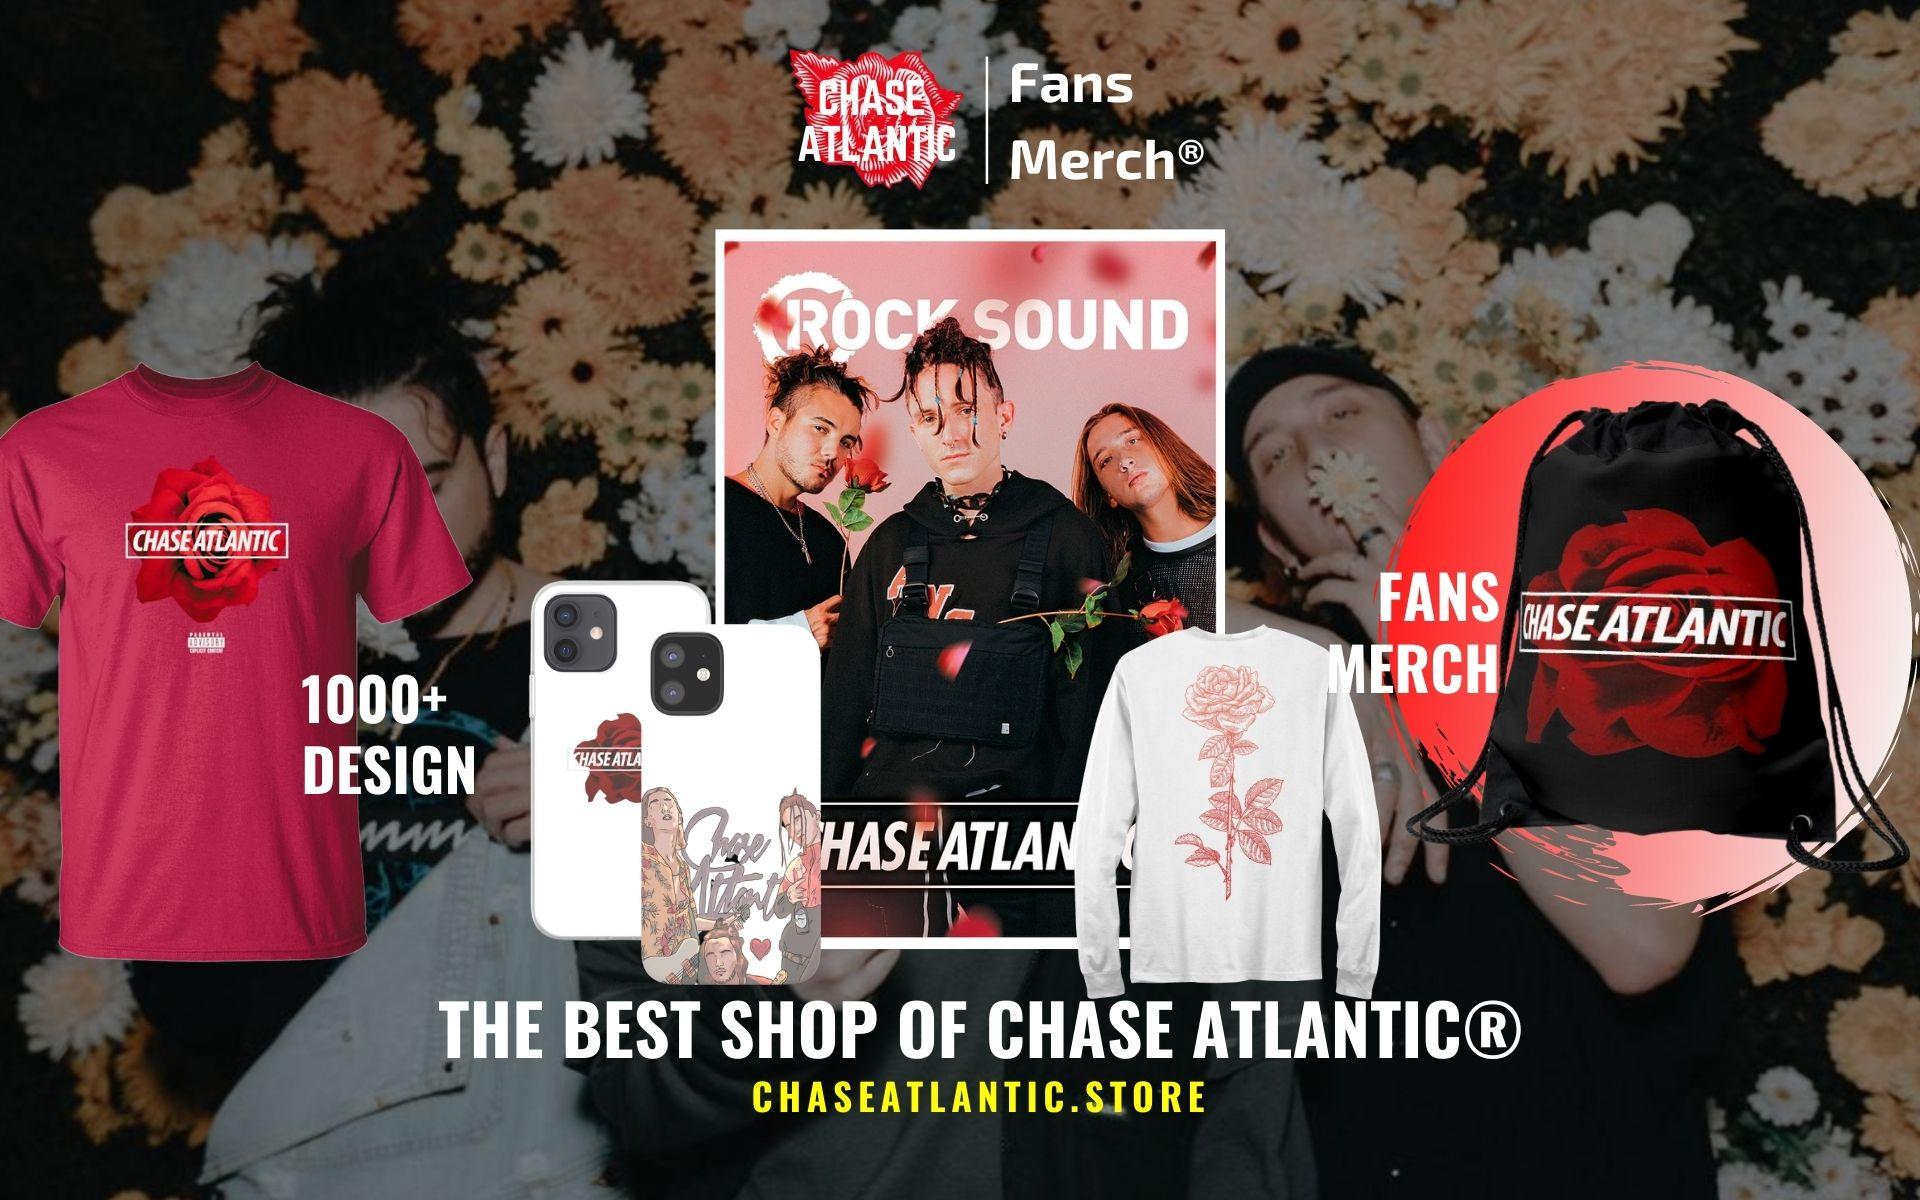 Chase Atlantic Merch Web Banner - Chase Atlantic Store